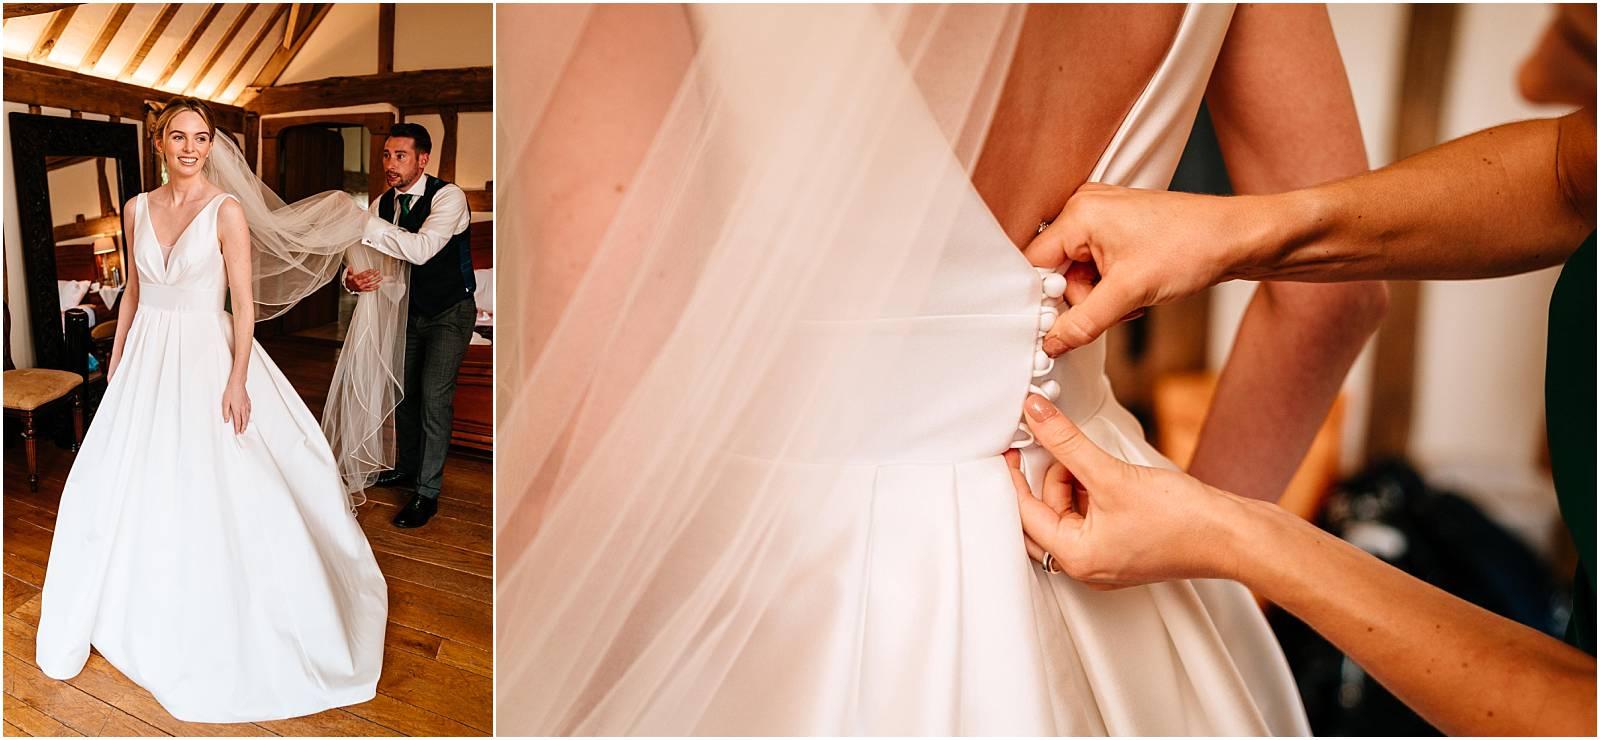 getting bride into wedding dress